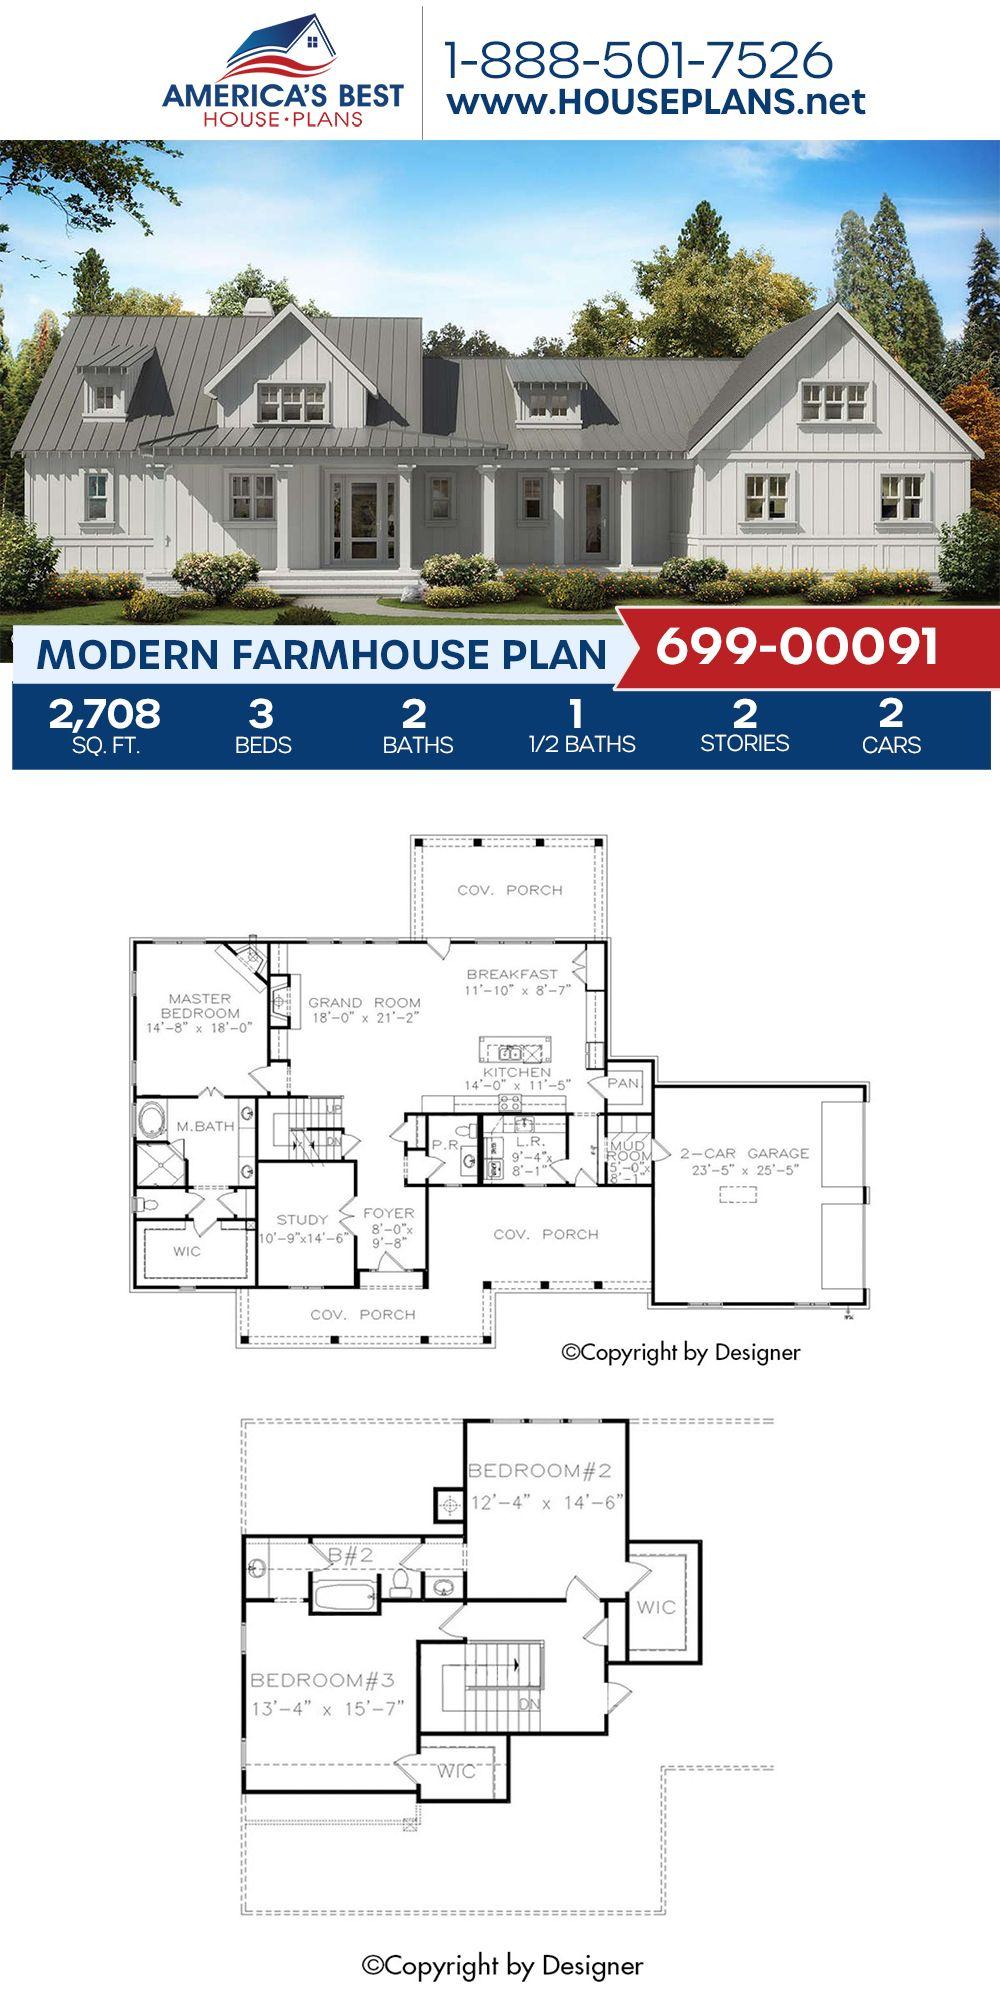 House Plan 699 00091 Modern Farmhouse Plan 2 708 Square Feet 3 Bedrooms 2 5 Bathrooms Farmhouse Plans Modern Farmhouse Plans House Plans